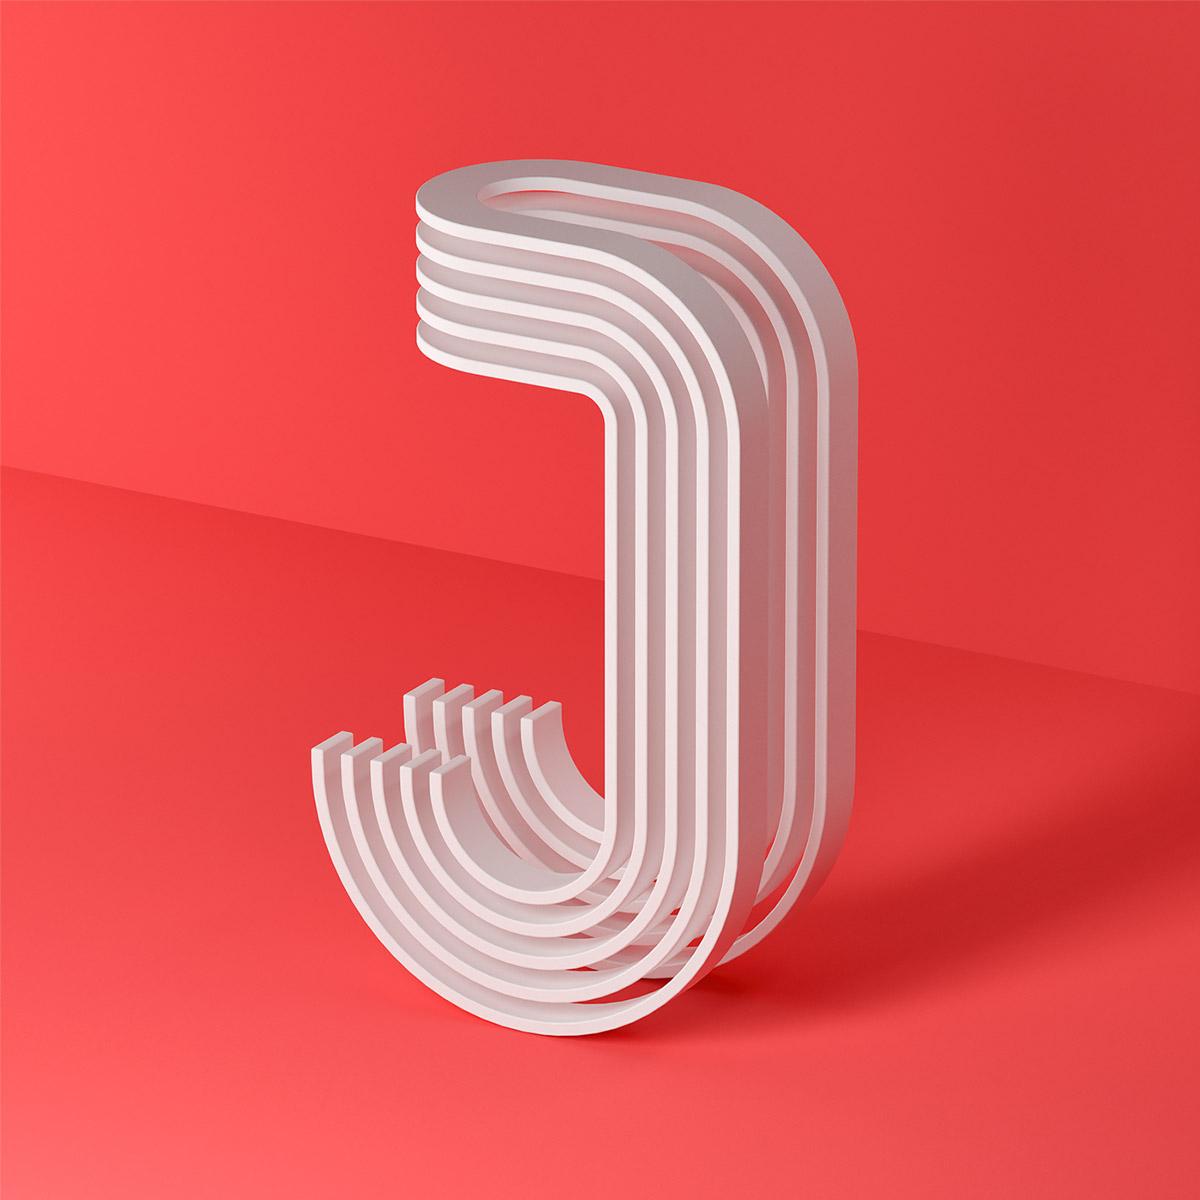 Serafim Mendes创意3D字母设计